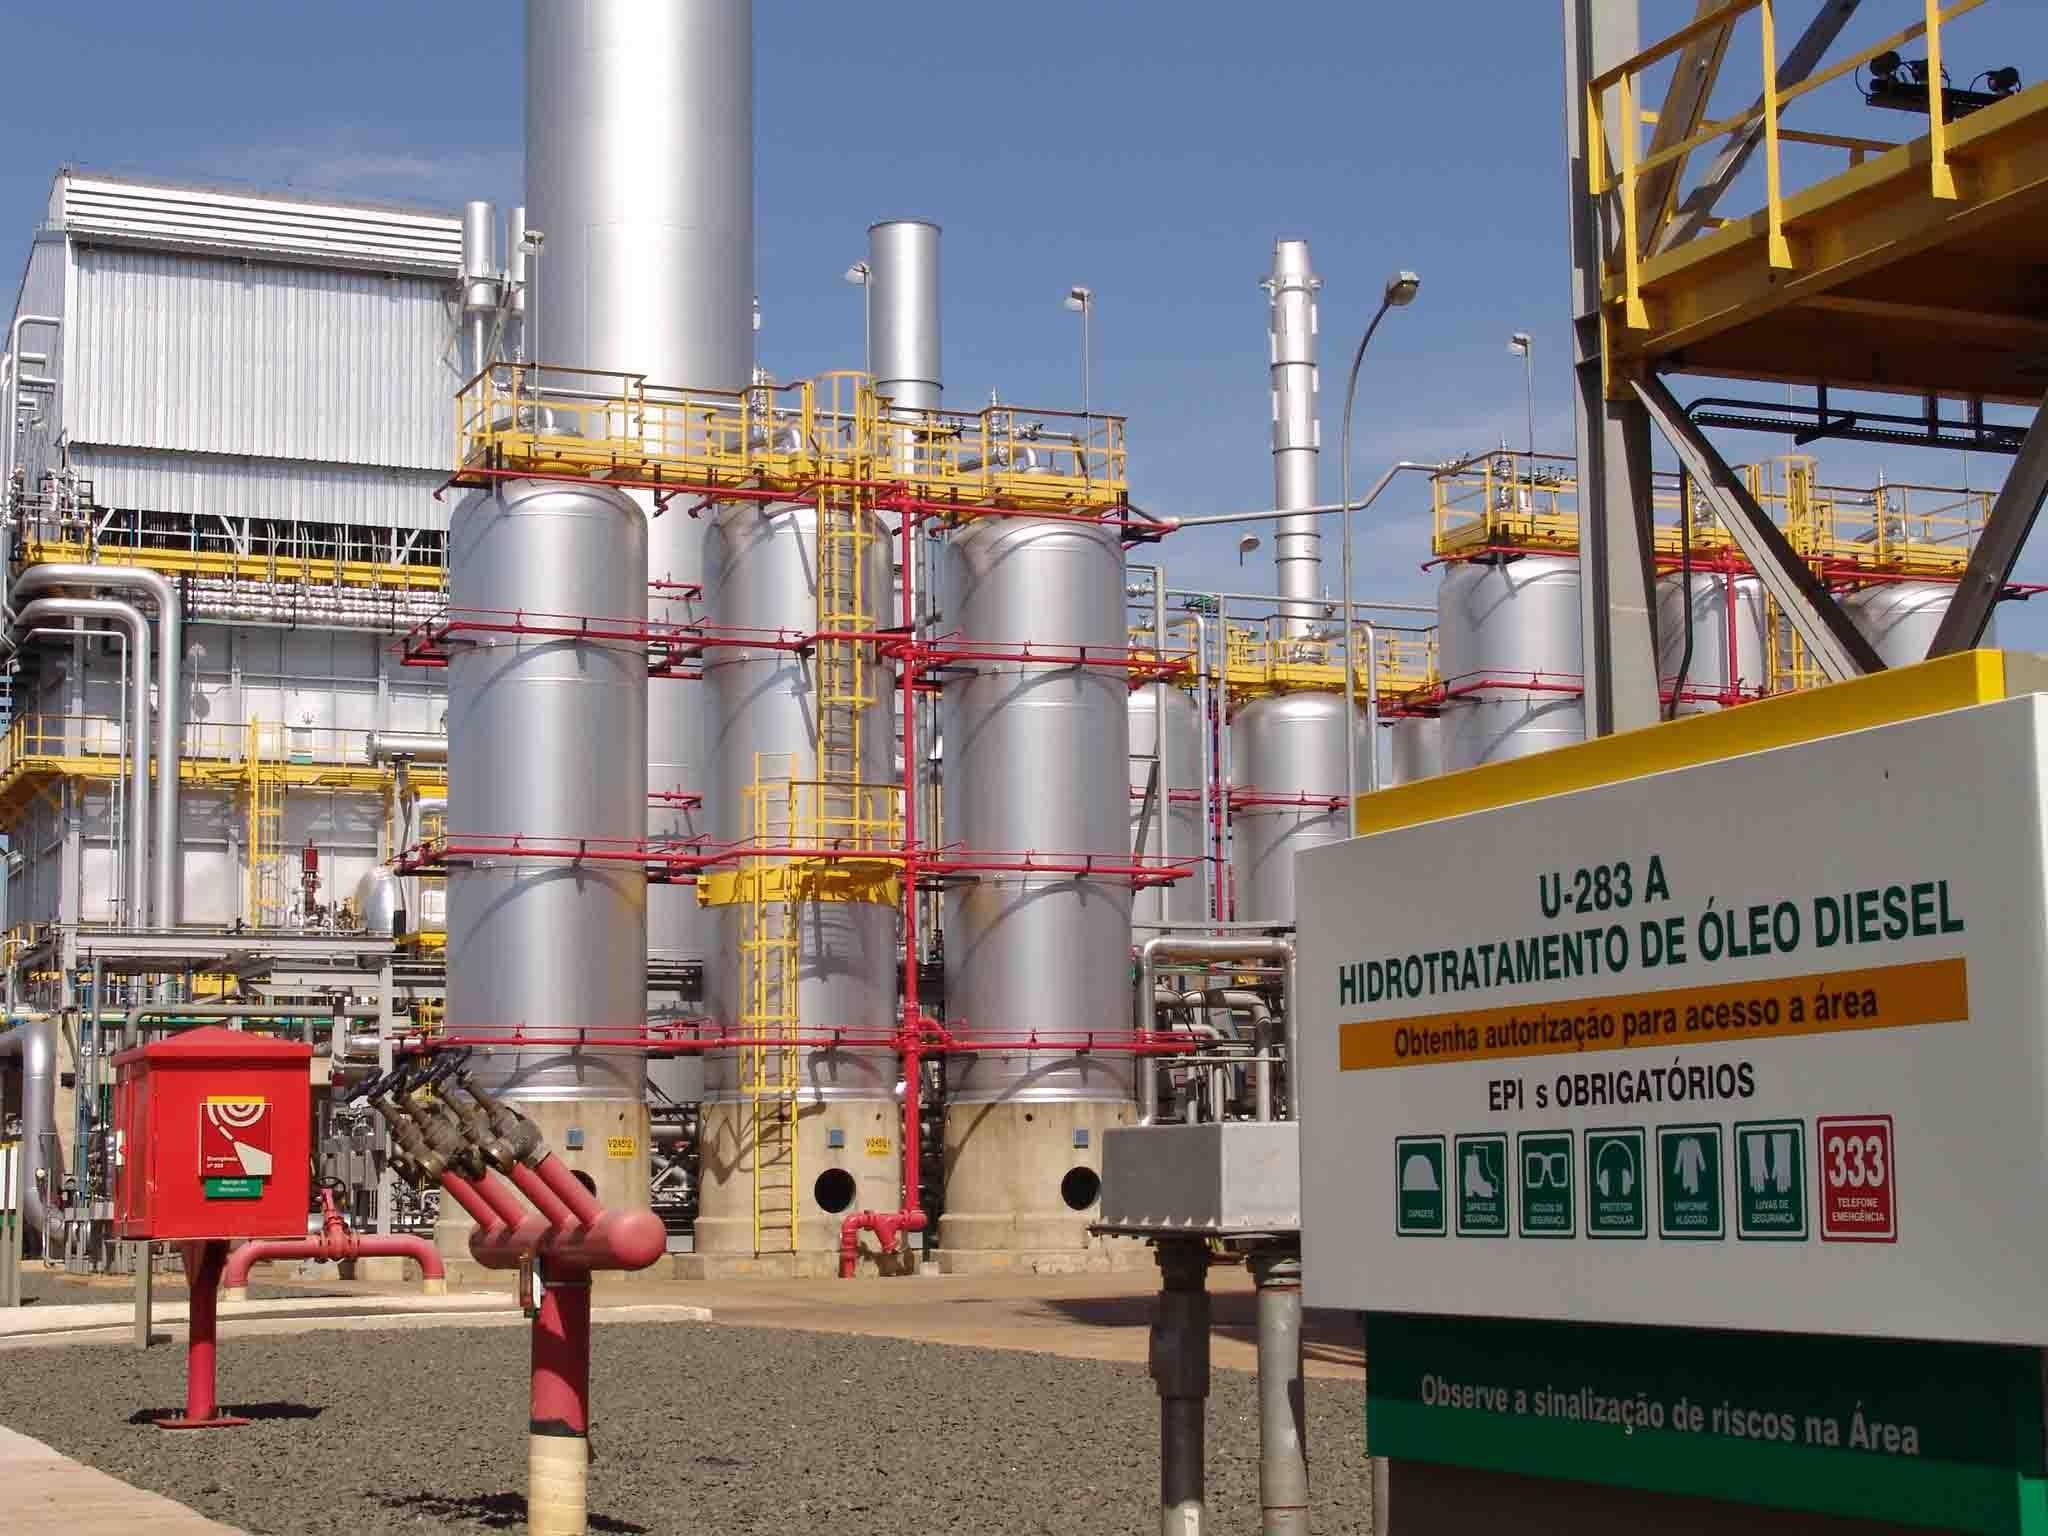 refinaria - diesel - preço - gnv - petróleo - emprego - sp - etanol - gasolina - combustível